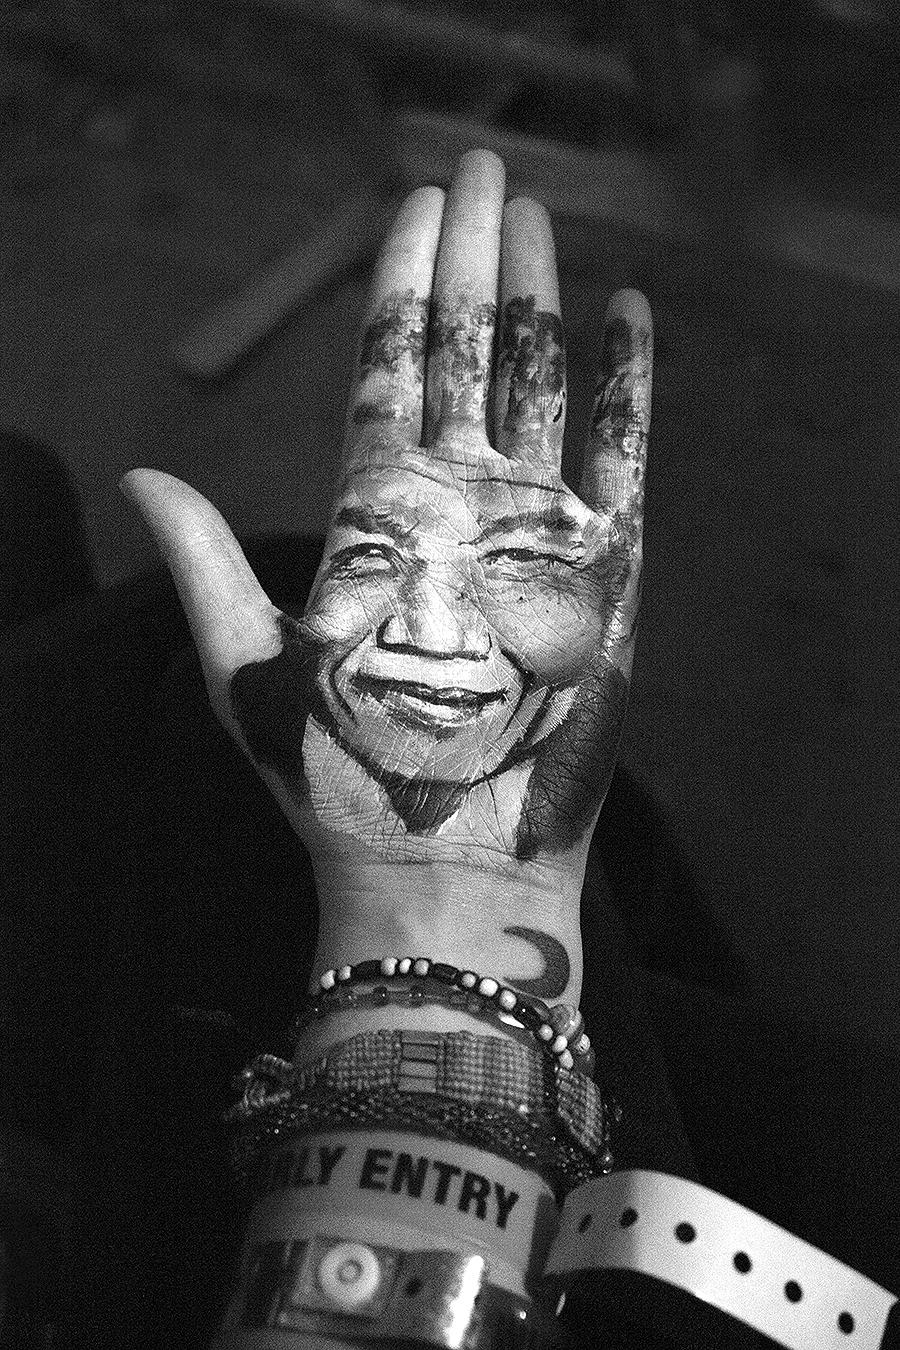 Catherine_Quigley_Photo_Tattoo_henna_Hand_Ink_fashion_body_art_decorating_body_Tony_Ward_studio